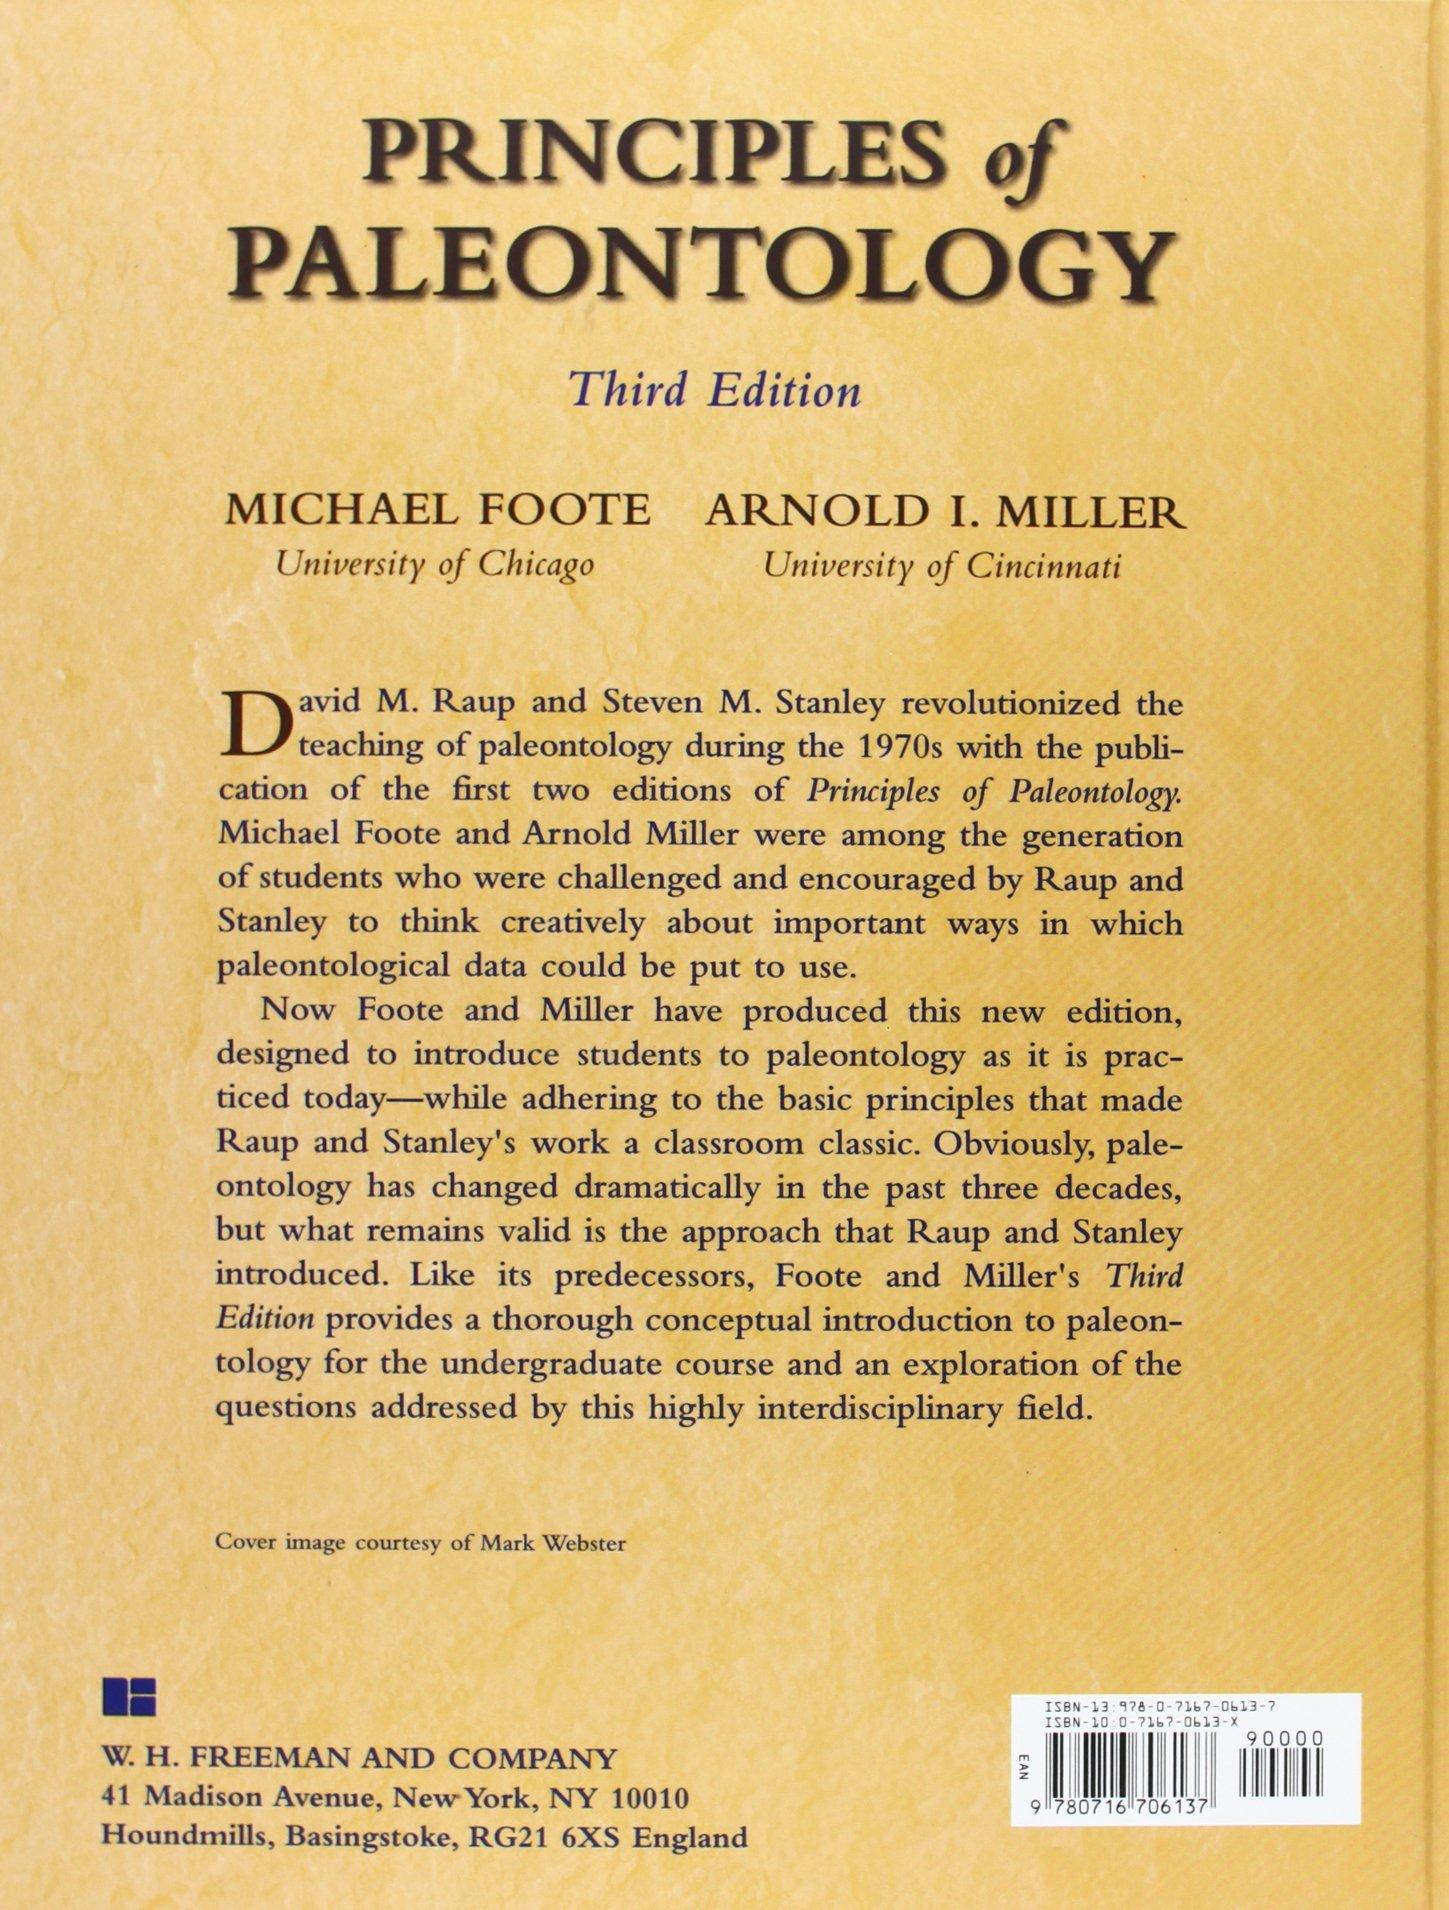 Principles of paleontology amazon co uk michael foote arnold i miller 9780716706137 books